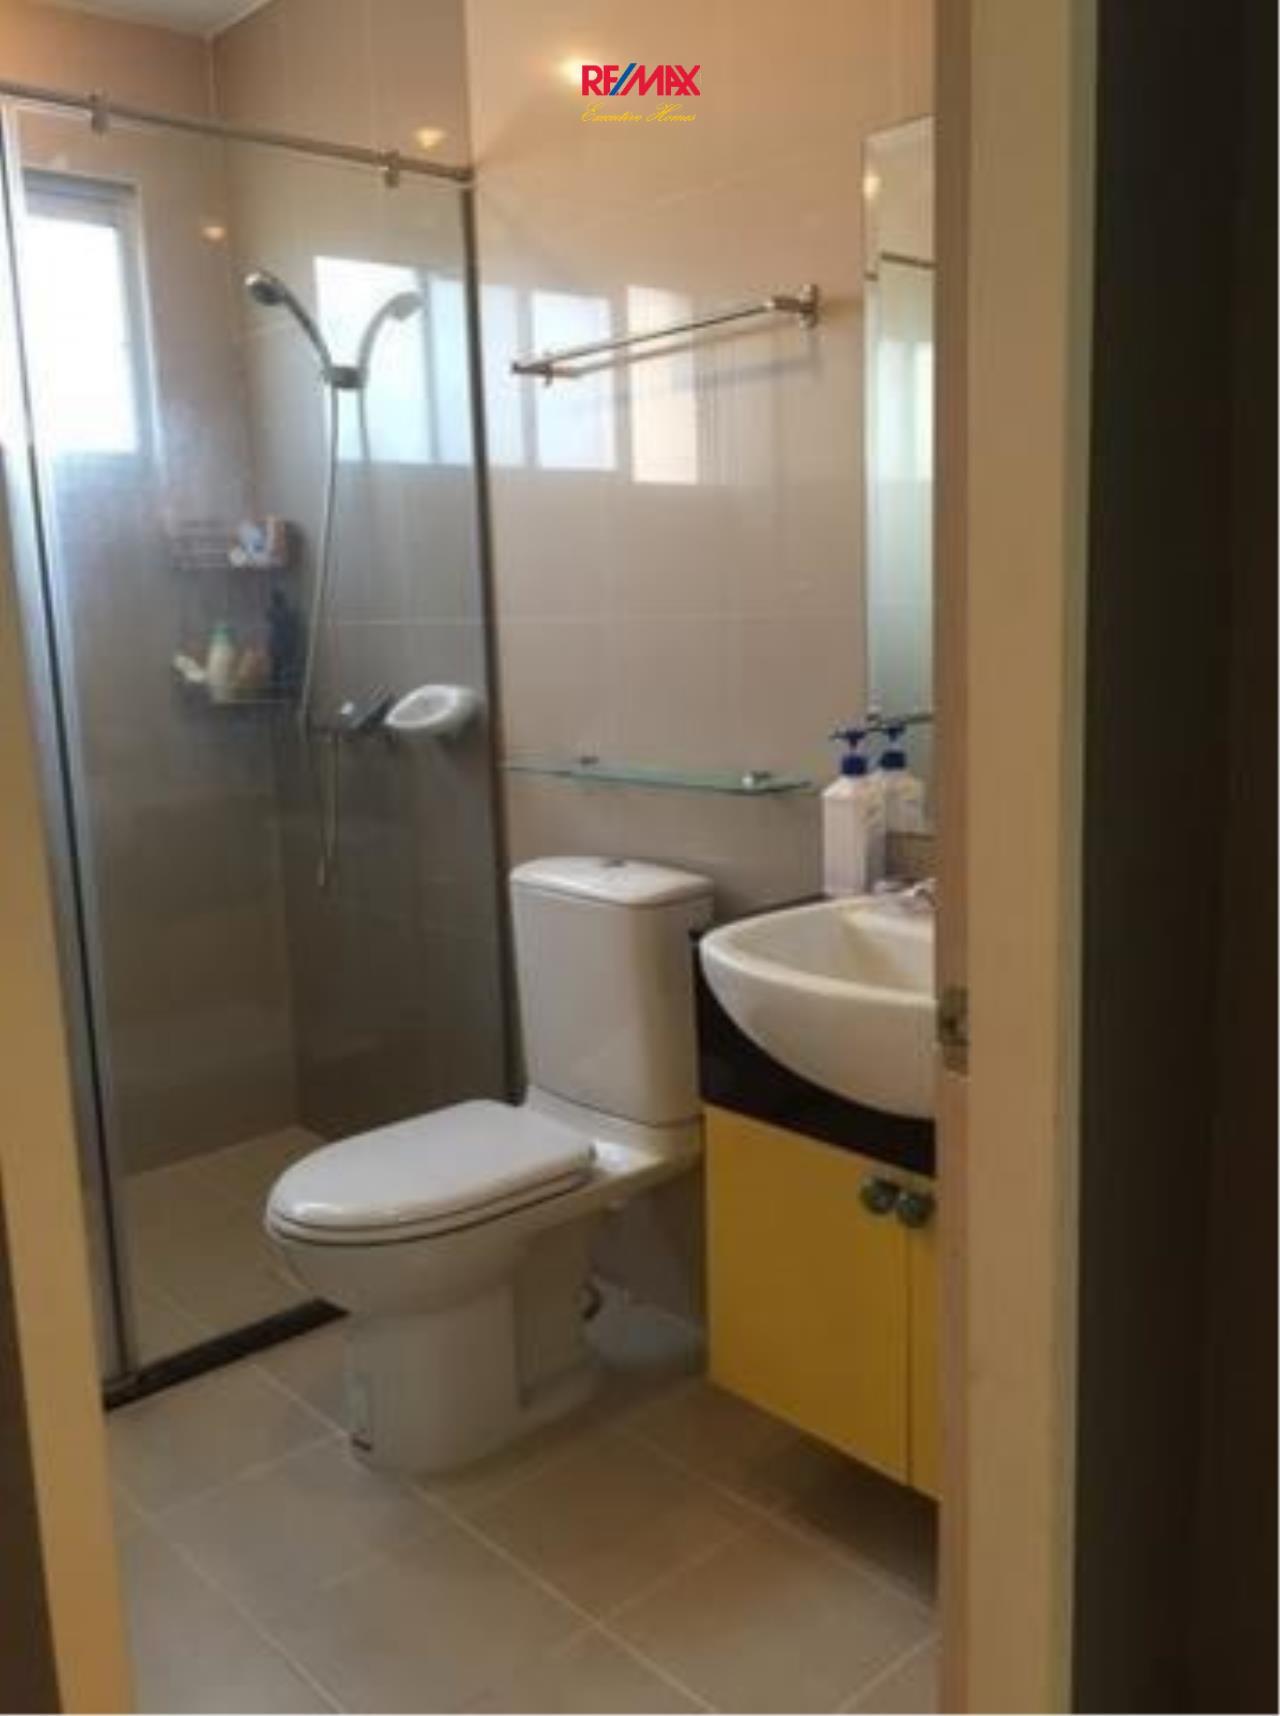 RE/MAX Executive Homes Agency's Nice 2 Bedroom for Sale Supalai Park Asoke - Ratchada 3